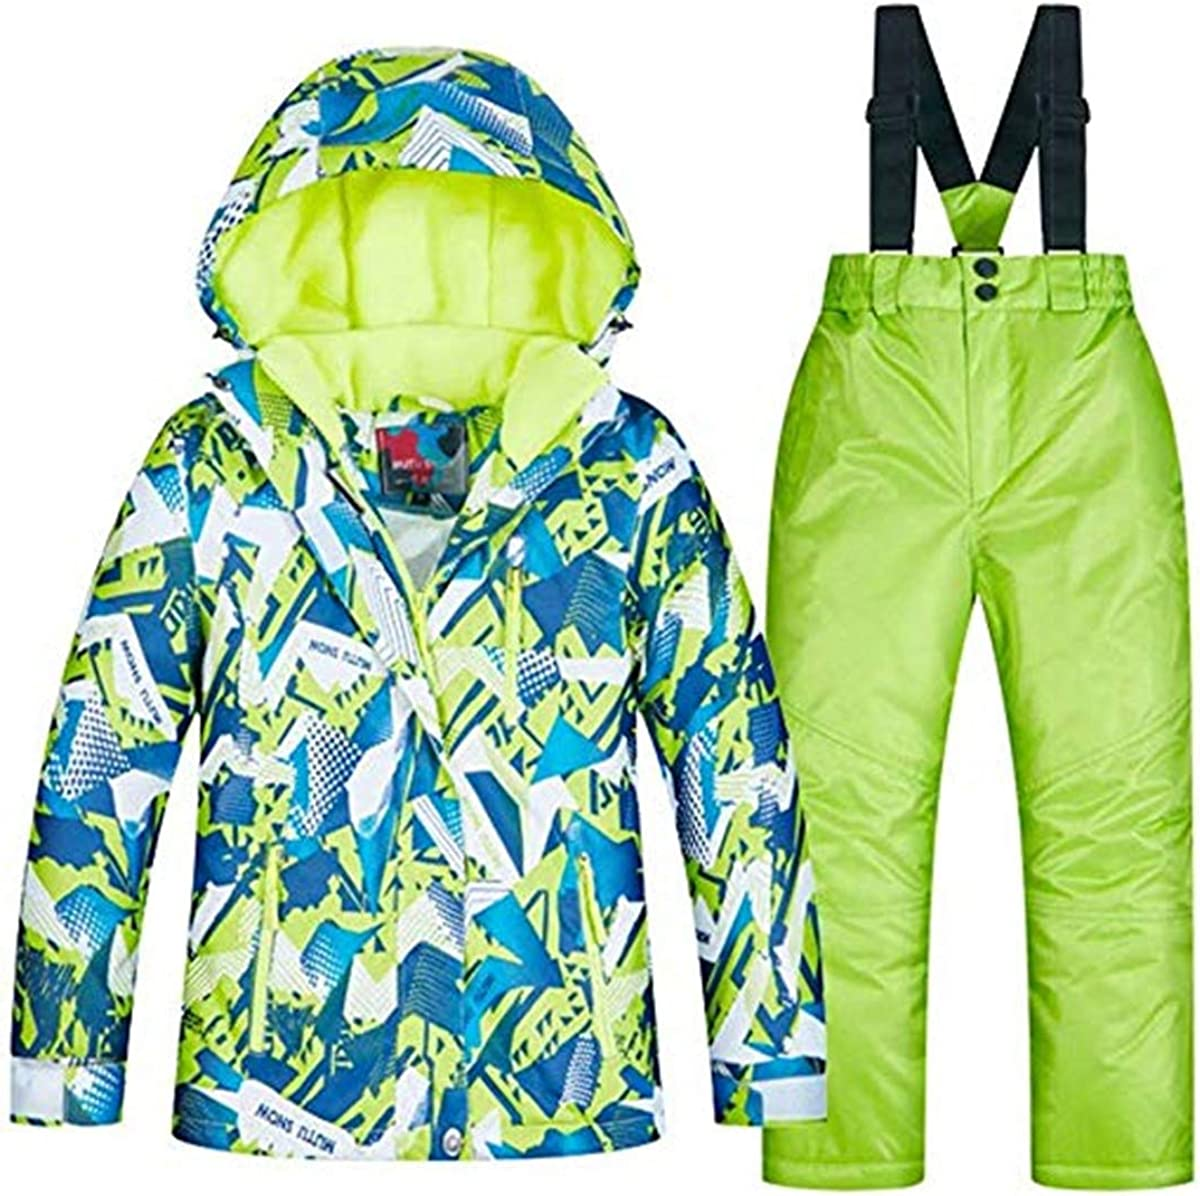 Baby Boys Kids Sport Outdoor Mountain Waterproof Windproof Snowboarding Jackets and Snow Ski Bib Pants Insulated Snowsuit Set